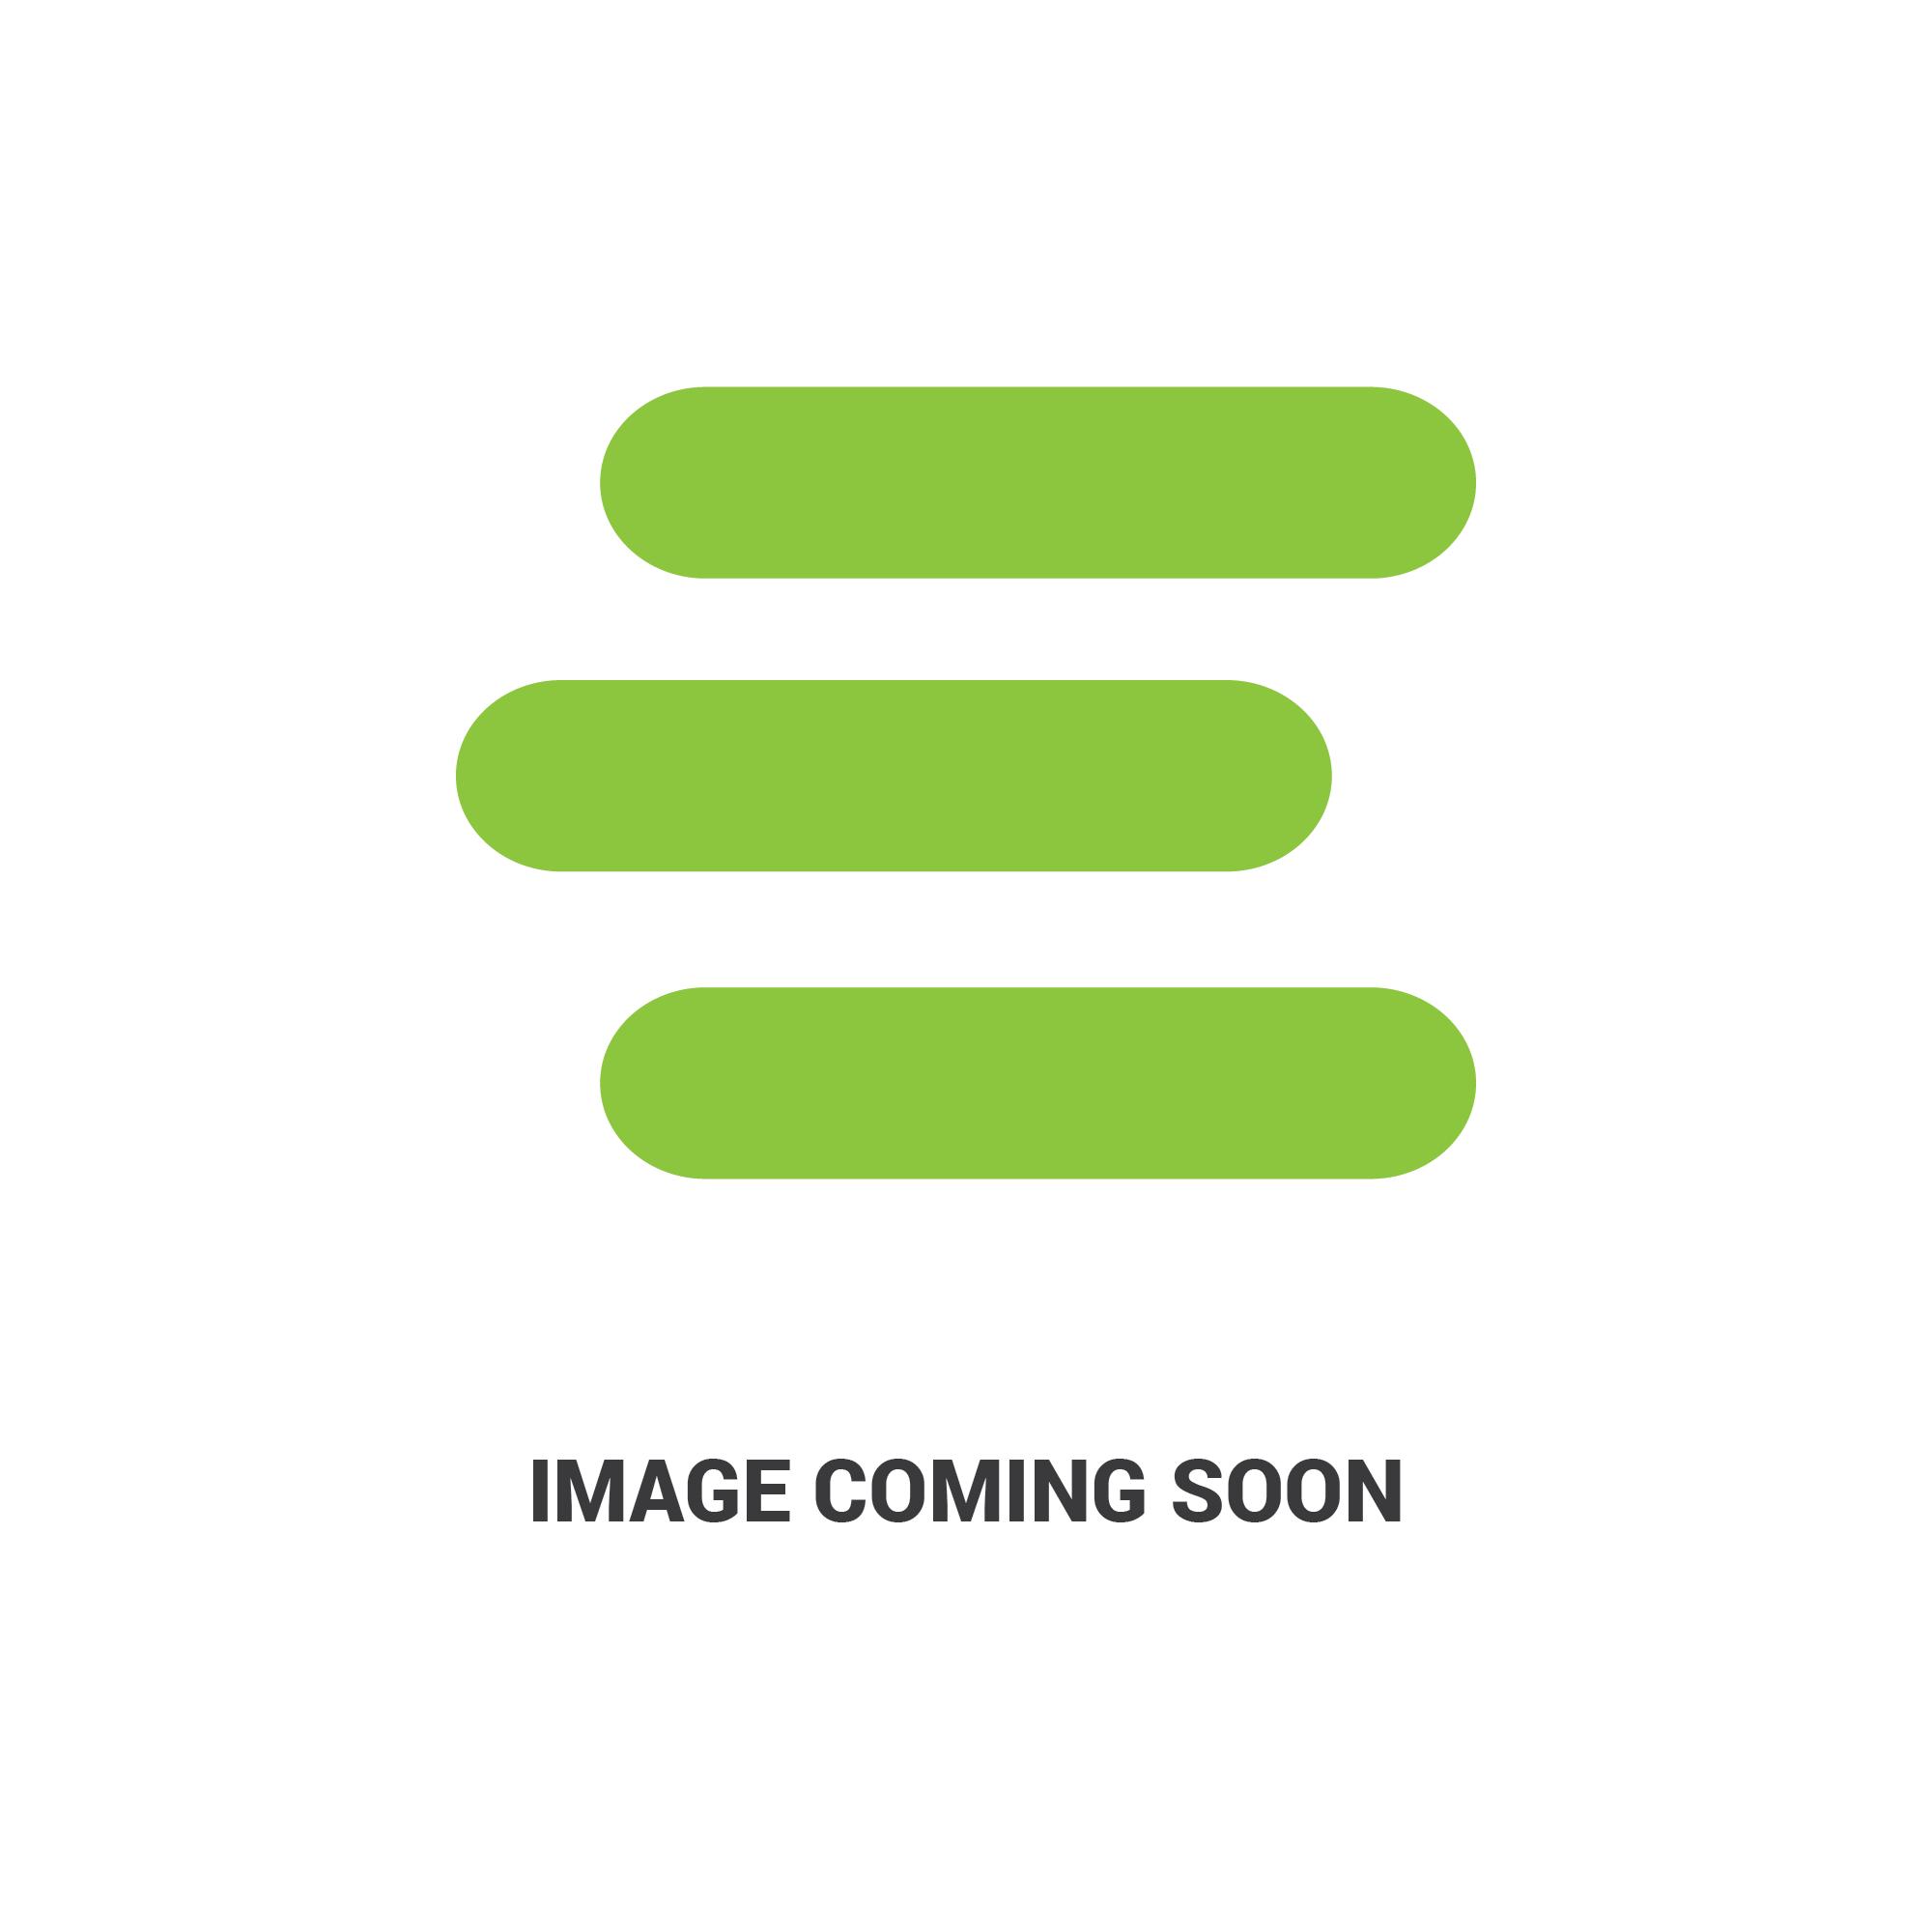 E-66103-459231981_1.jpg